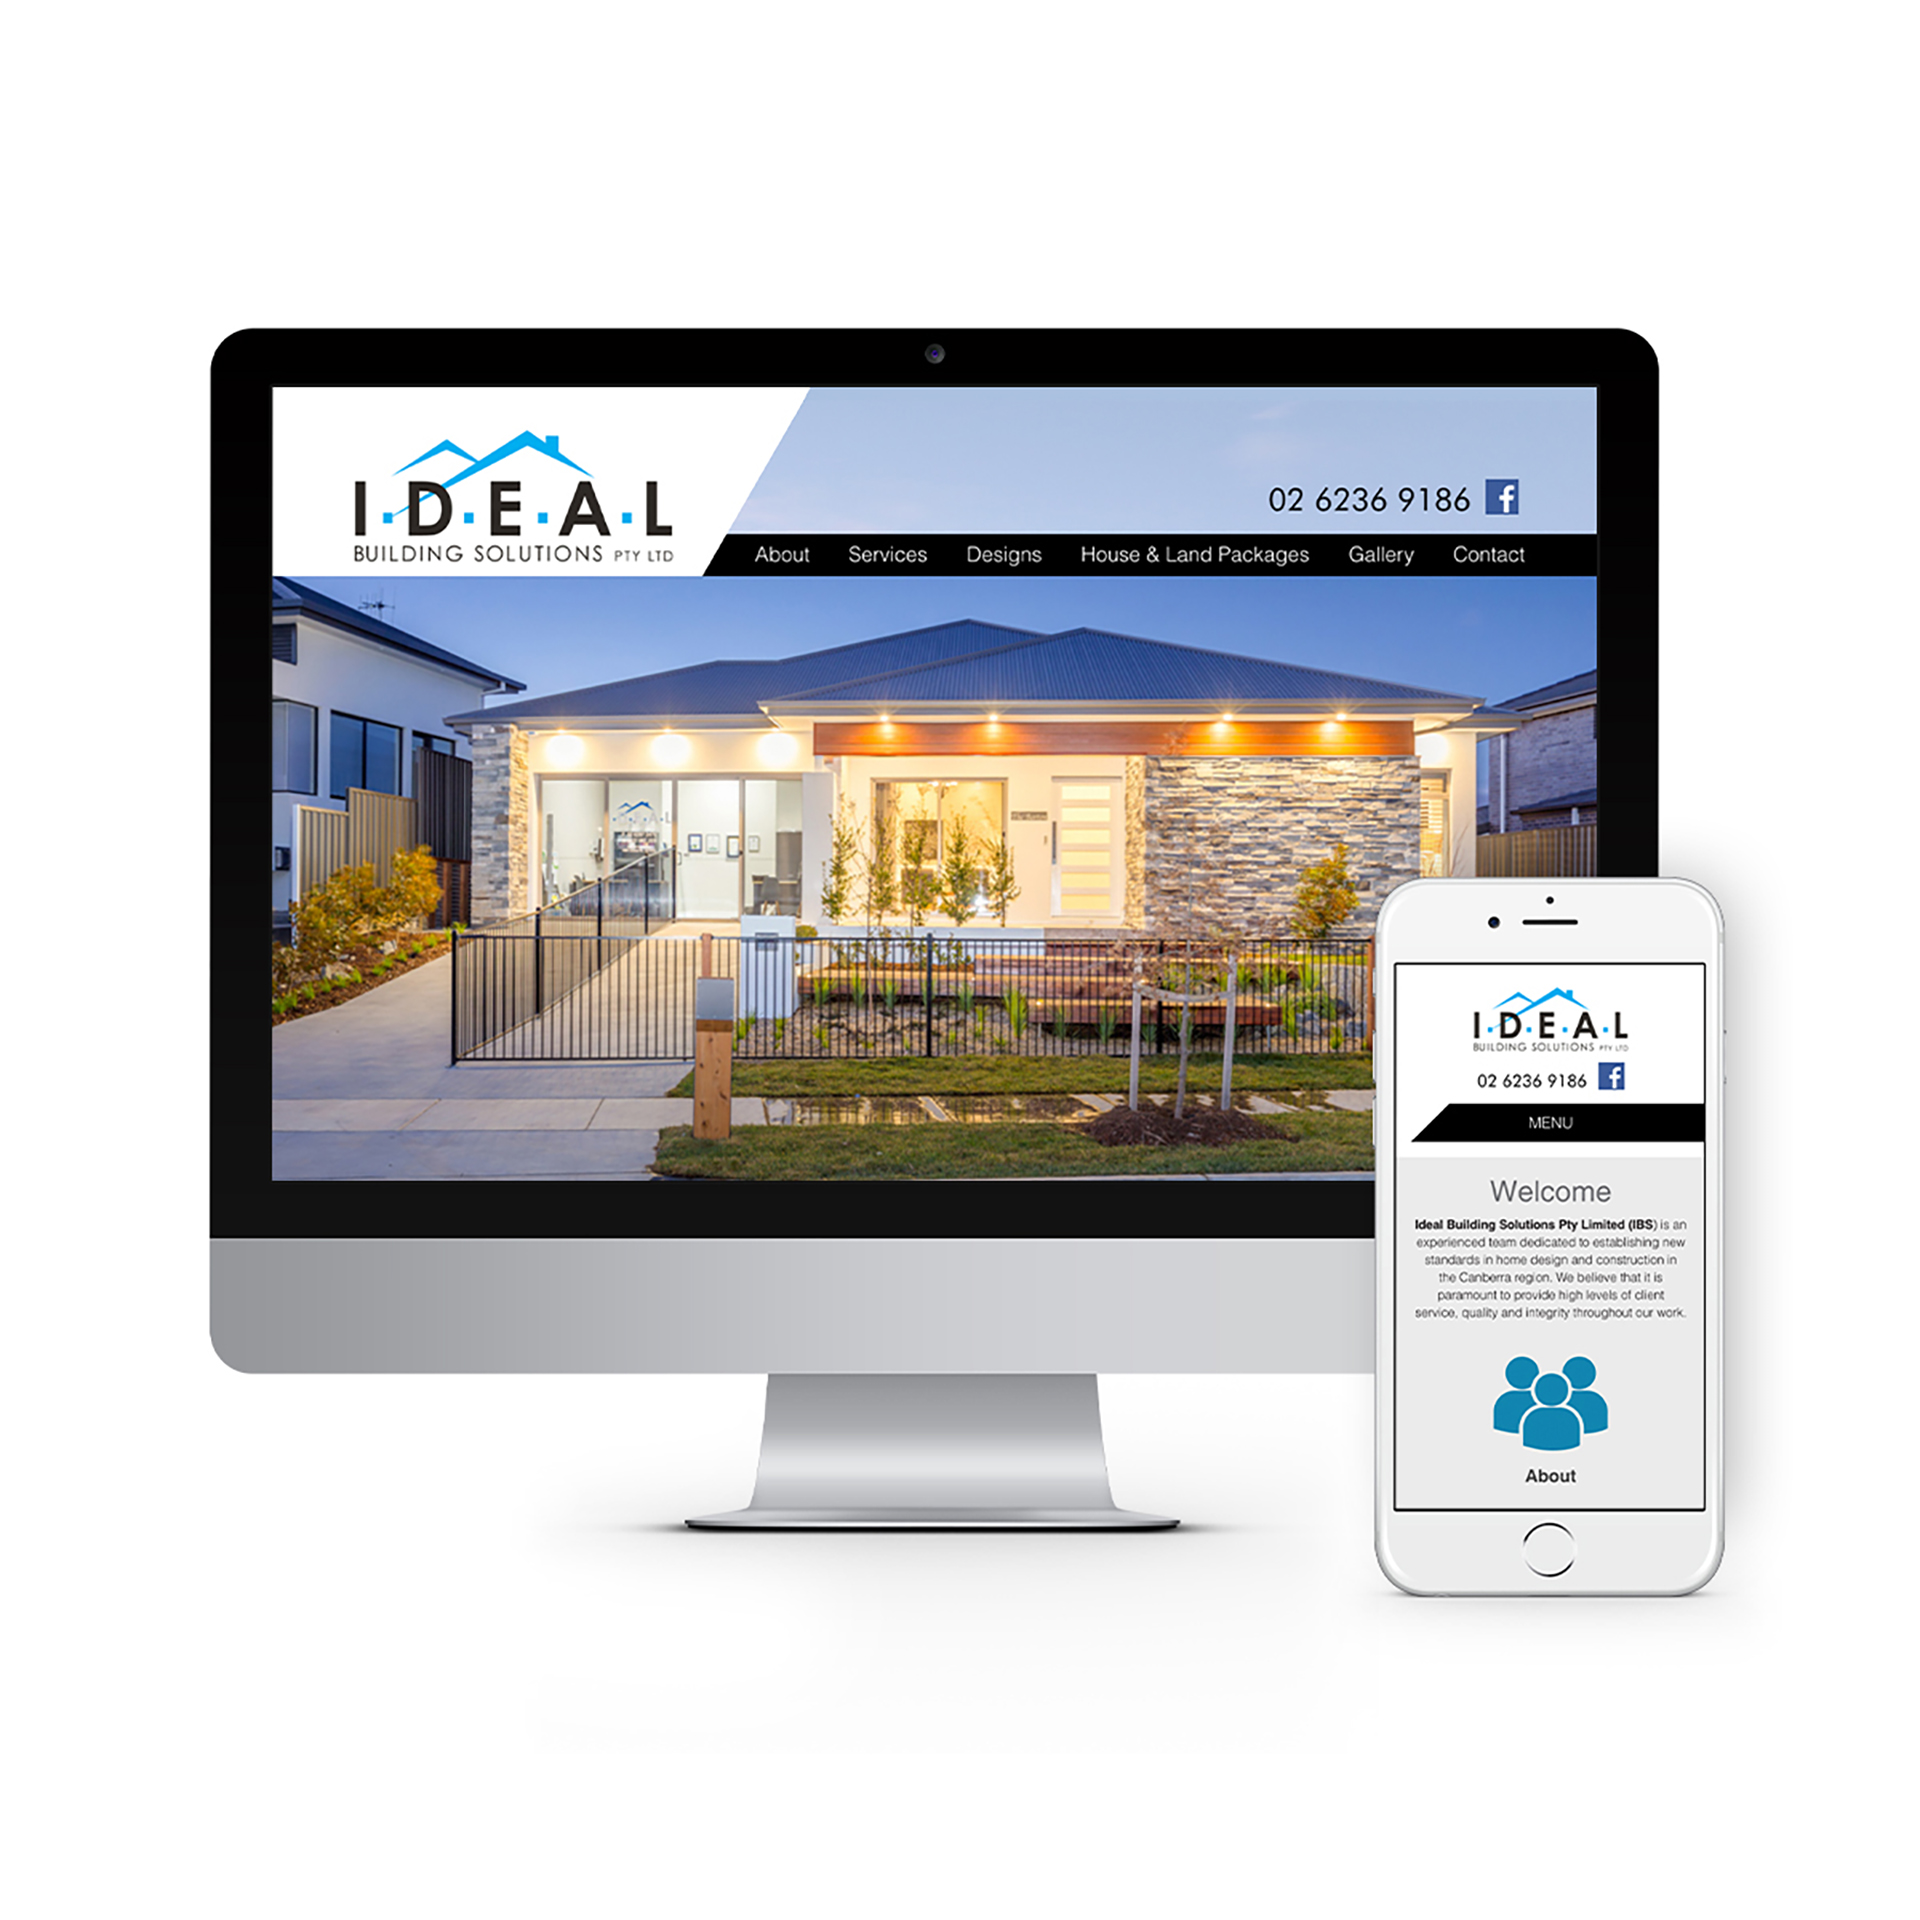 Ideal Building Solutions Canberra Website Design 2020